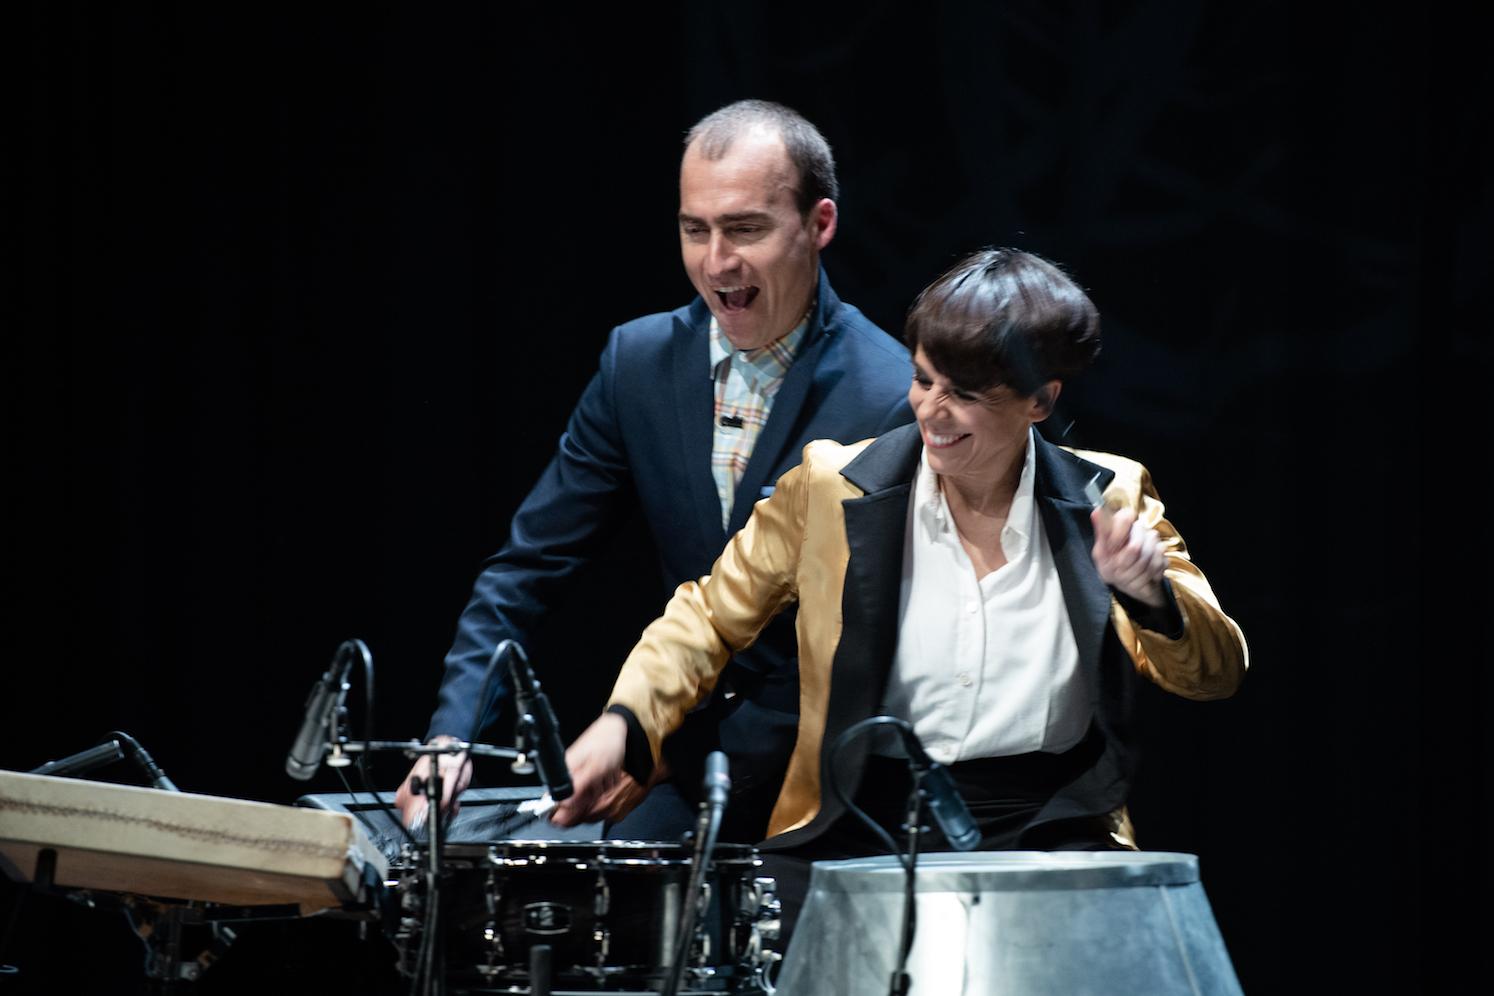 Flamencodanses Leonor Leal en slagwerker Antonio Moreno, in 'Nocturne' van Leonor Leal.